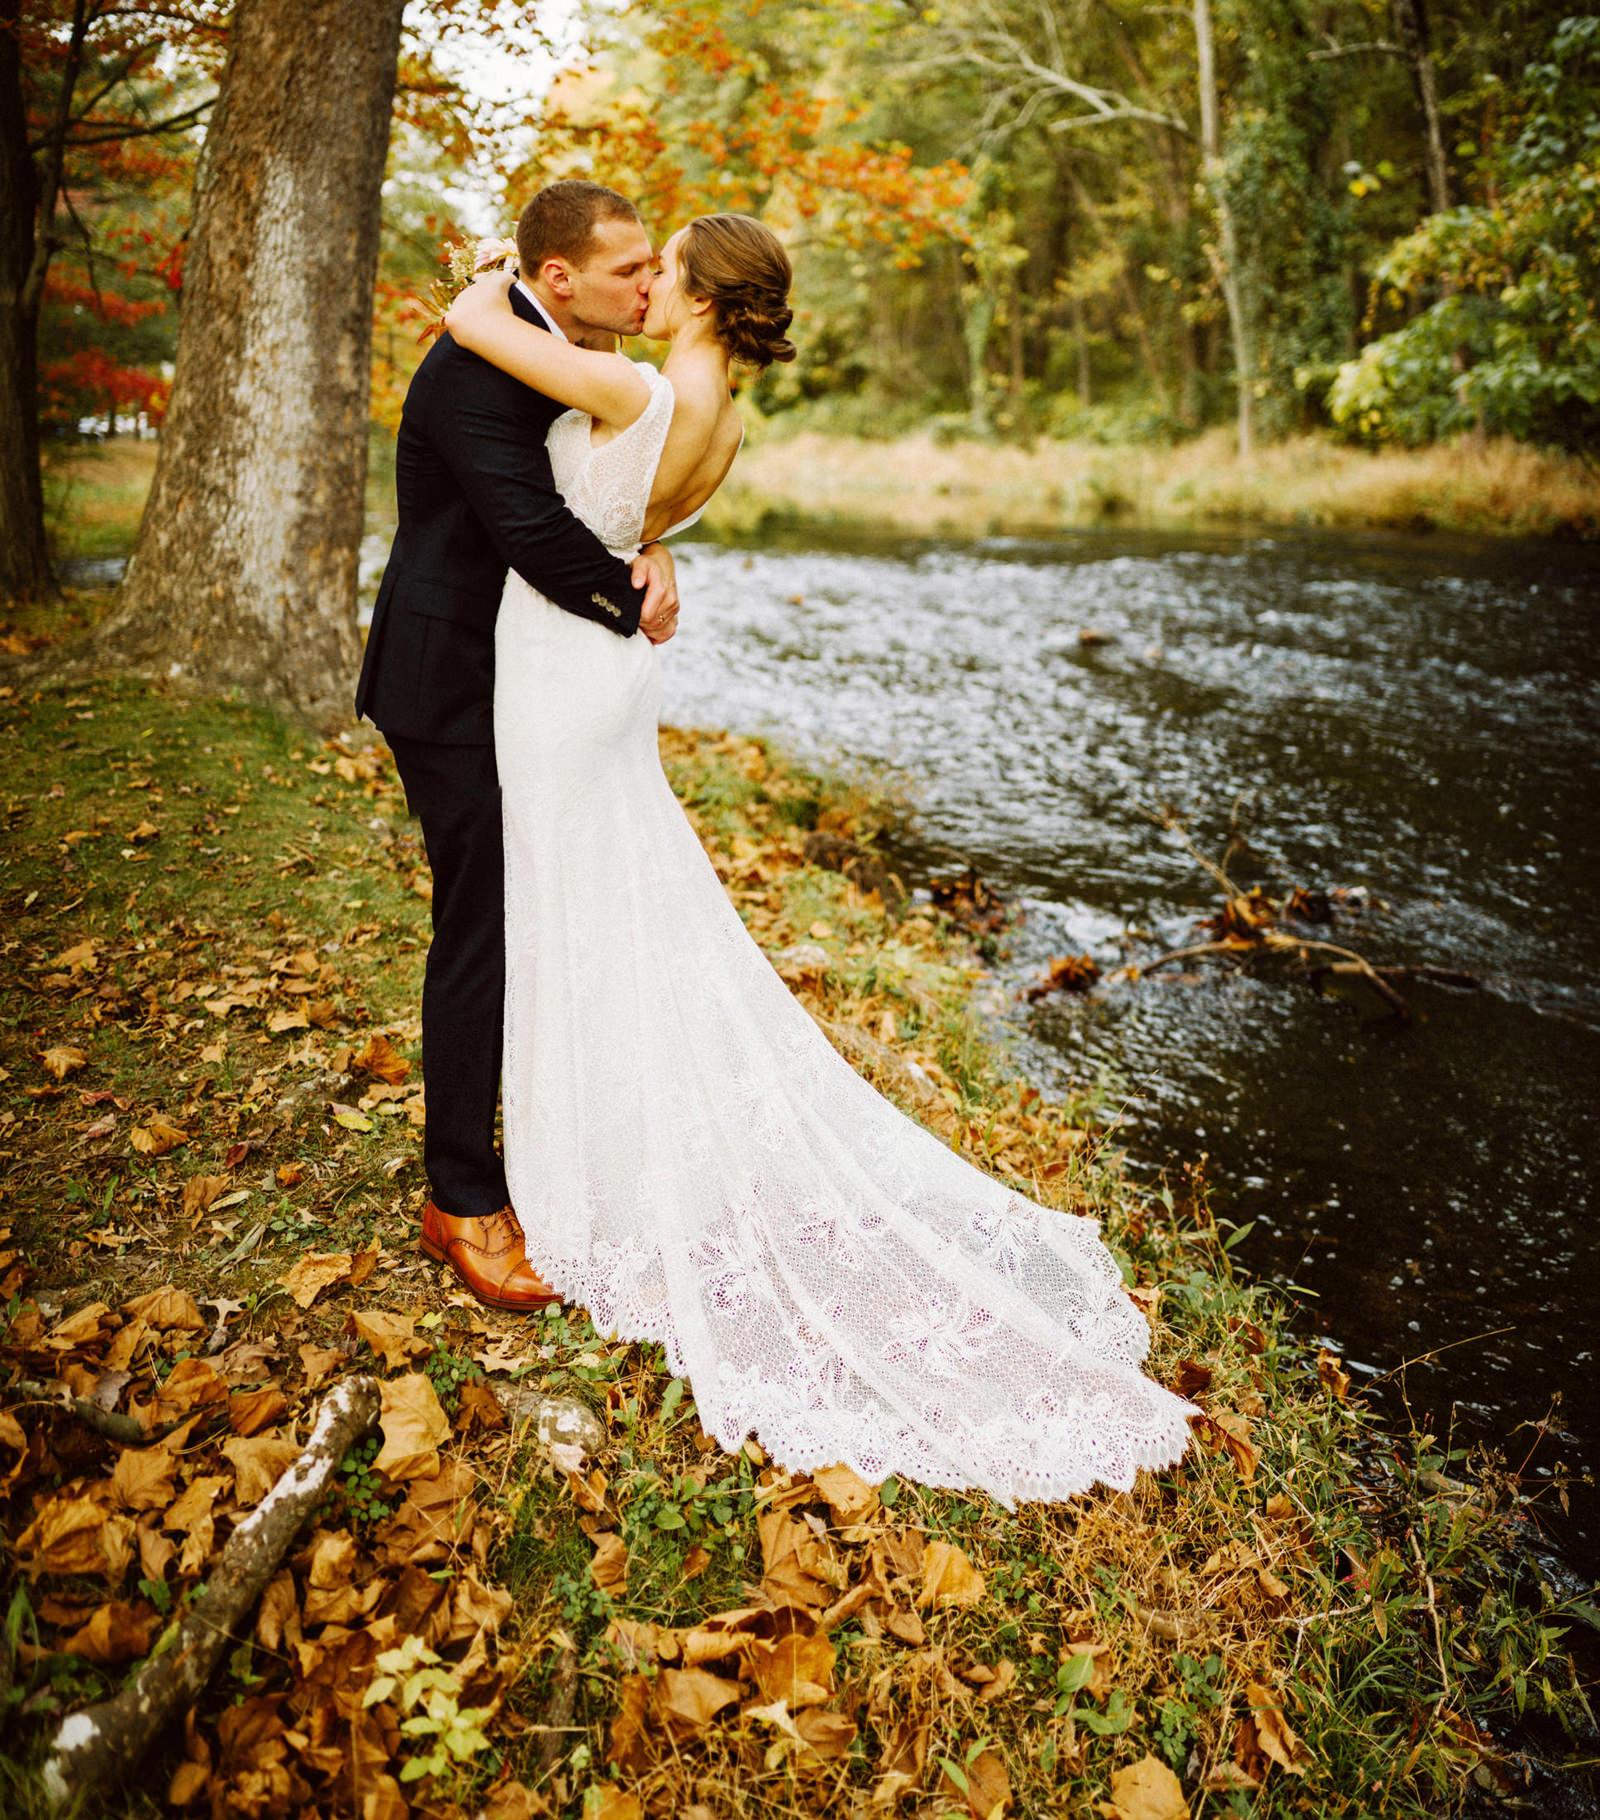 bridgeport-wedding-112 BRIDGEPORT, CONNECTICUT BACKYARD WEDDING